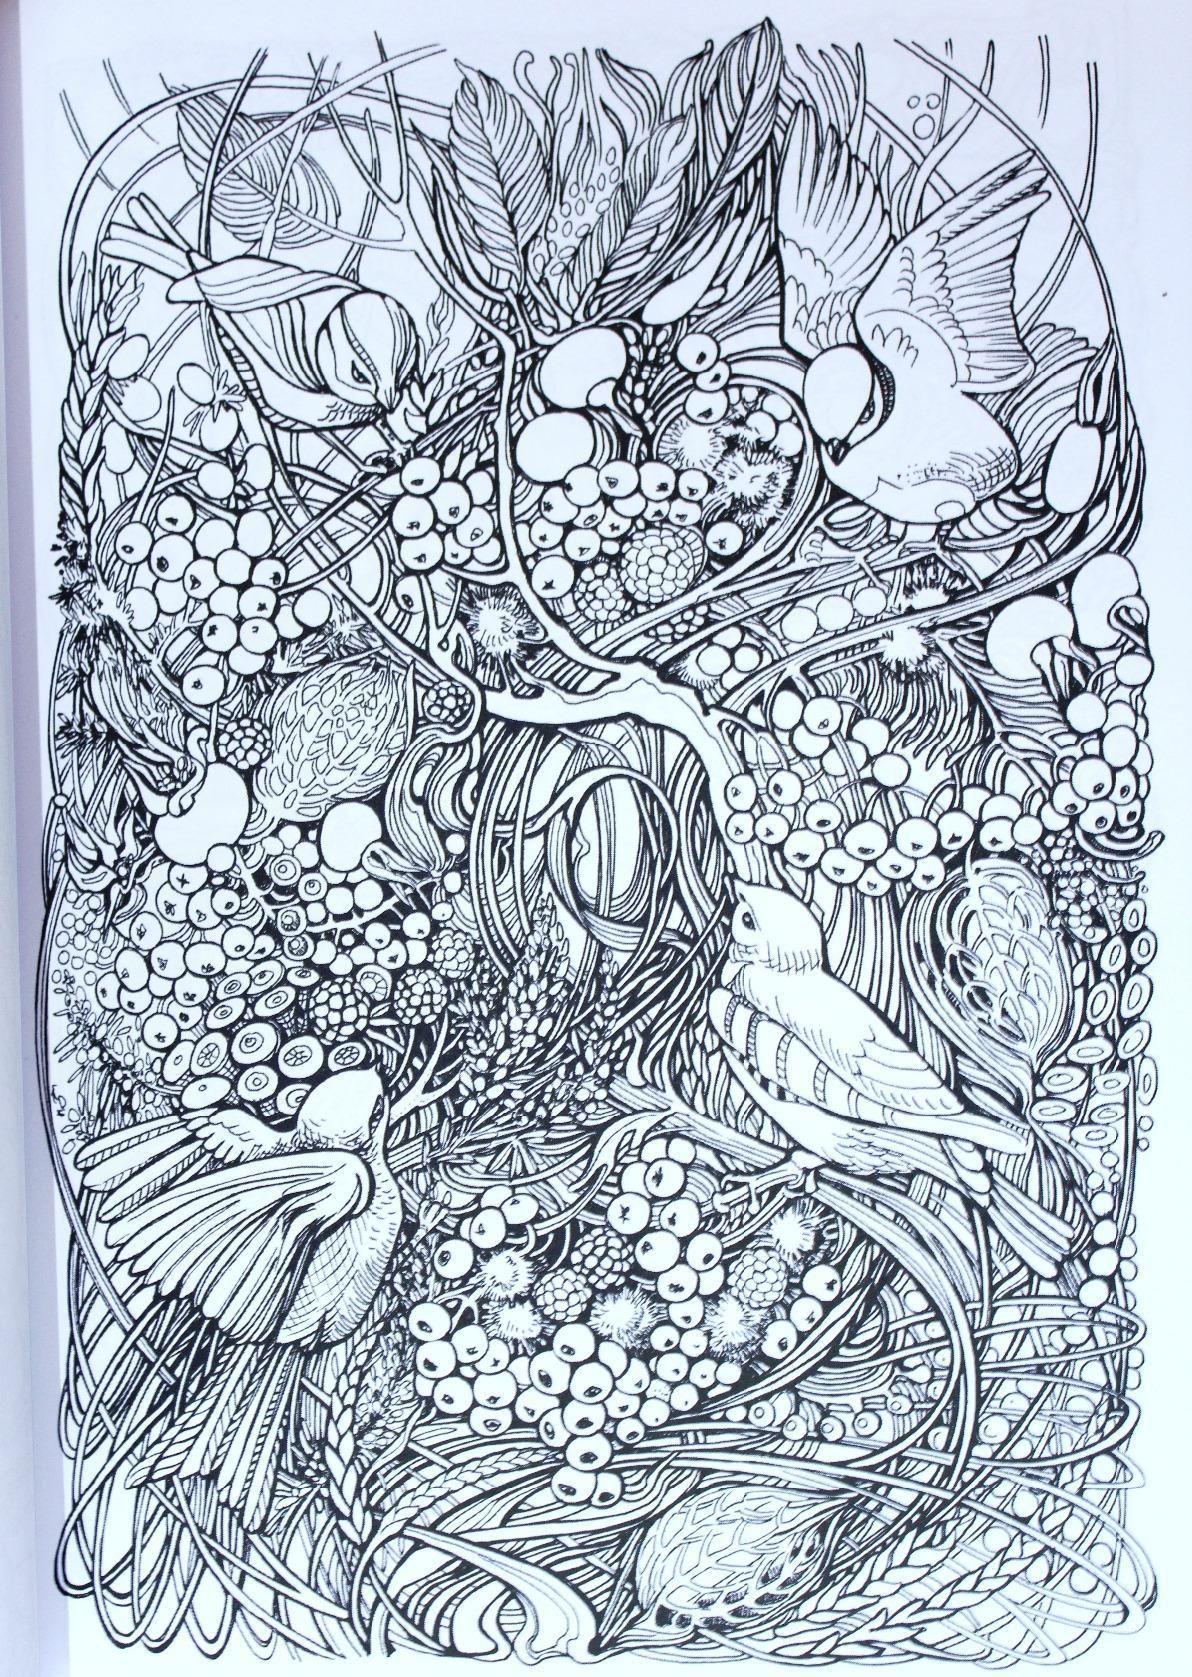 Coloring books for childhood diseases - Amazon Com Manic Botanic Zifflin S Coloring Book 9781523692057 Zifflin